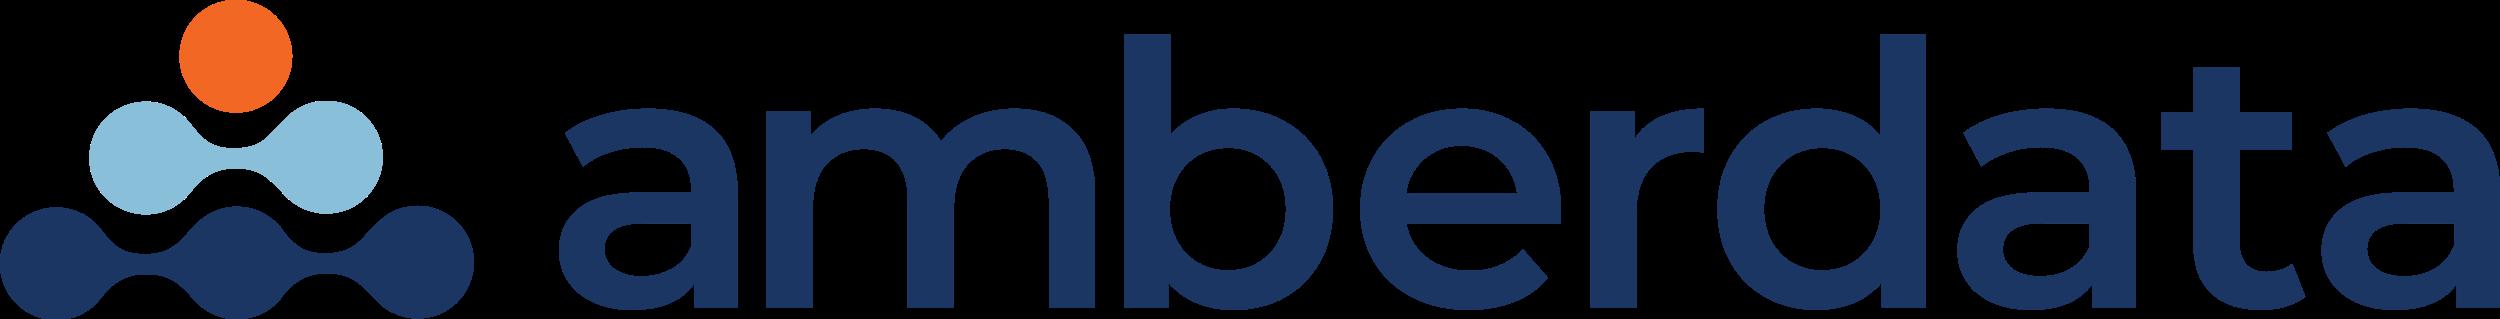 Amberdata Gold Sponsor at DAS 202 during NY Blockchain Week